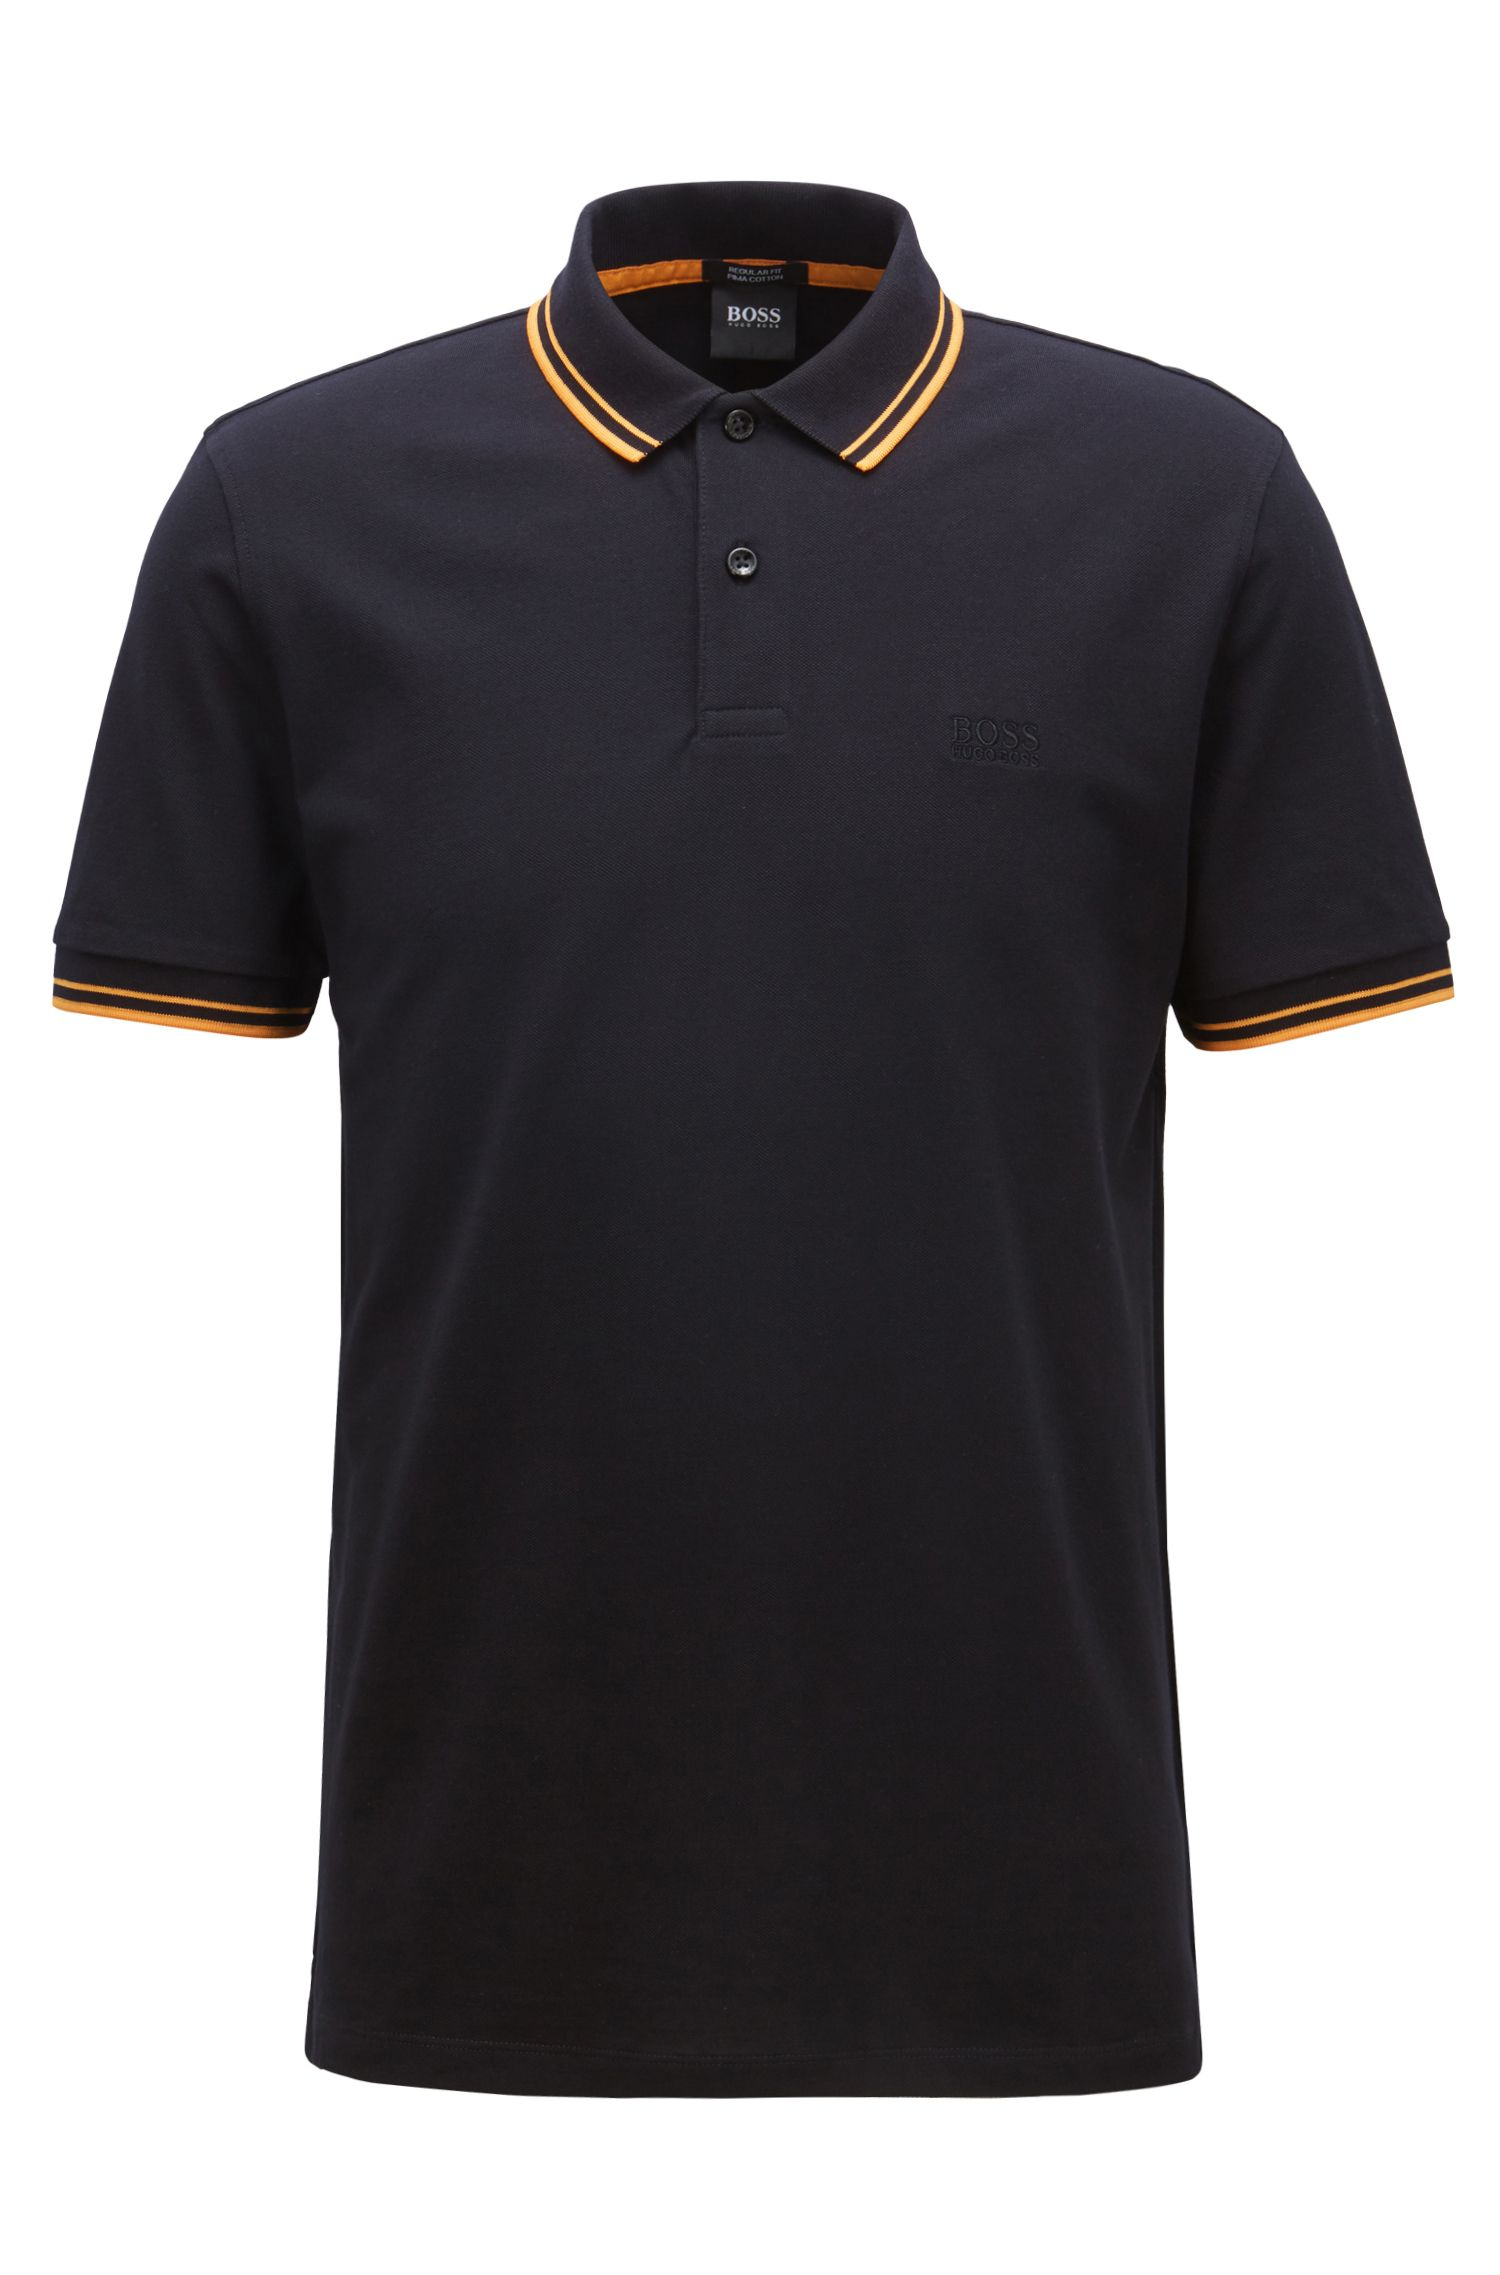 Regular-Fit Poloshirt aus feinem Baumwoll-Piqué, Hellblau